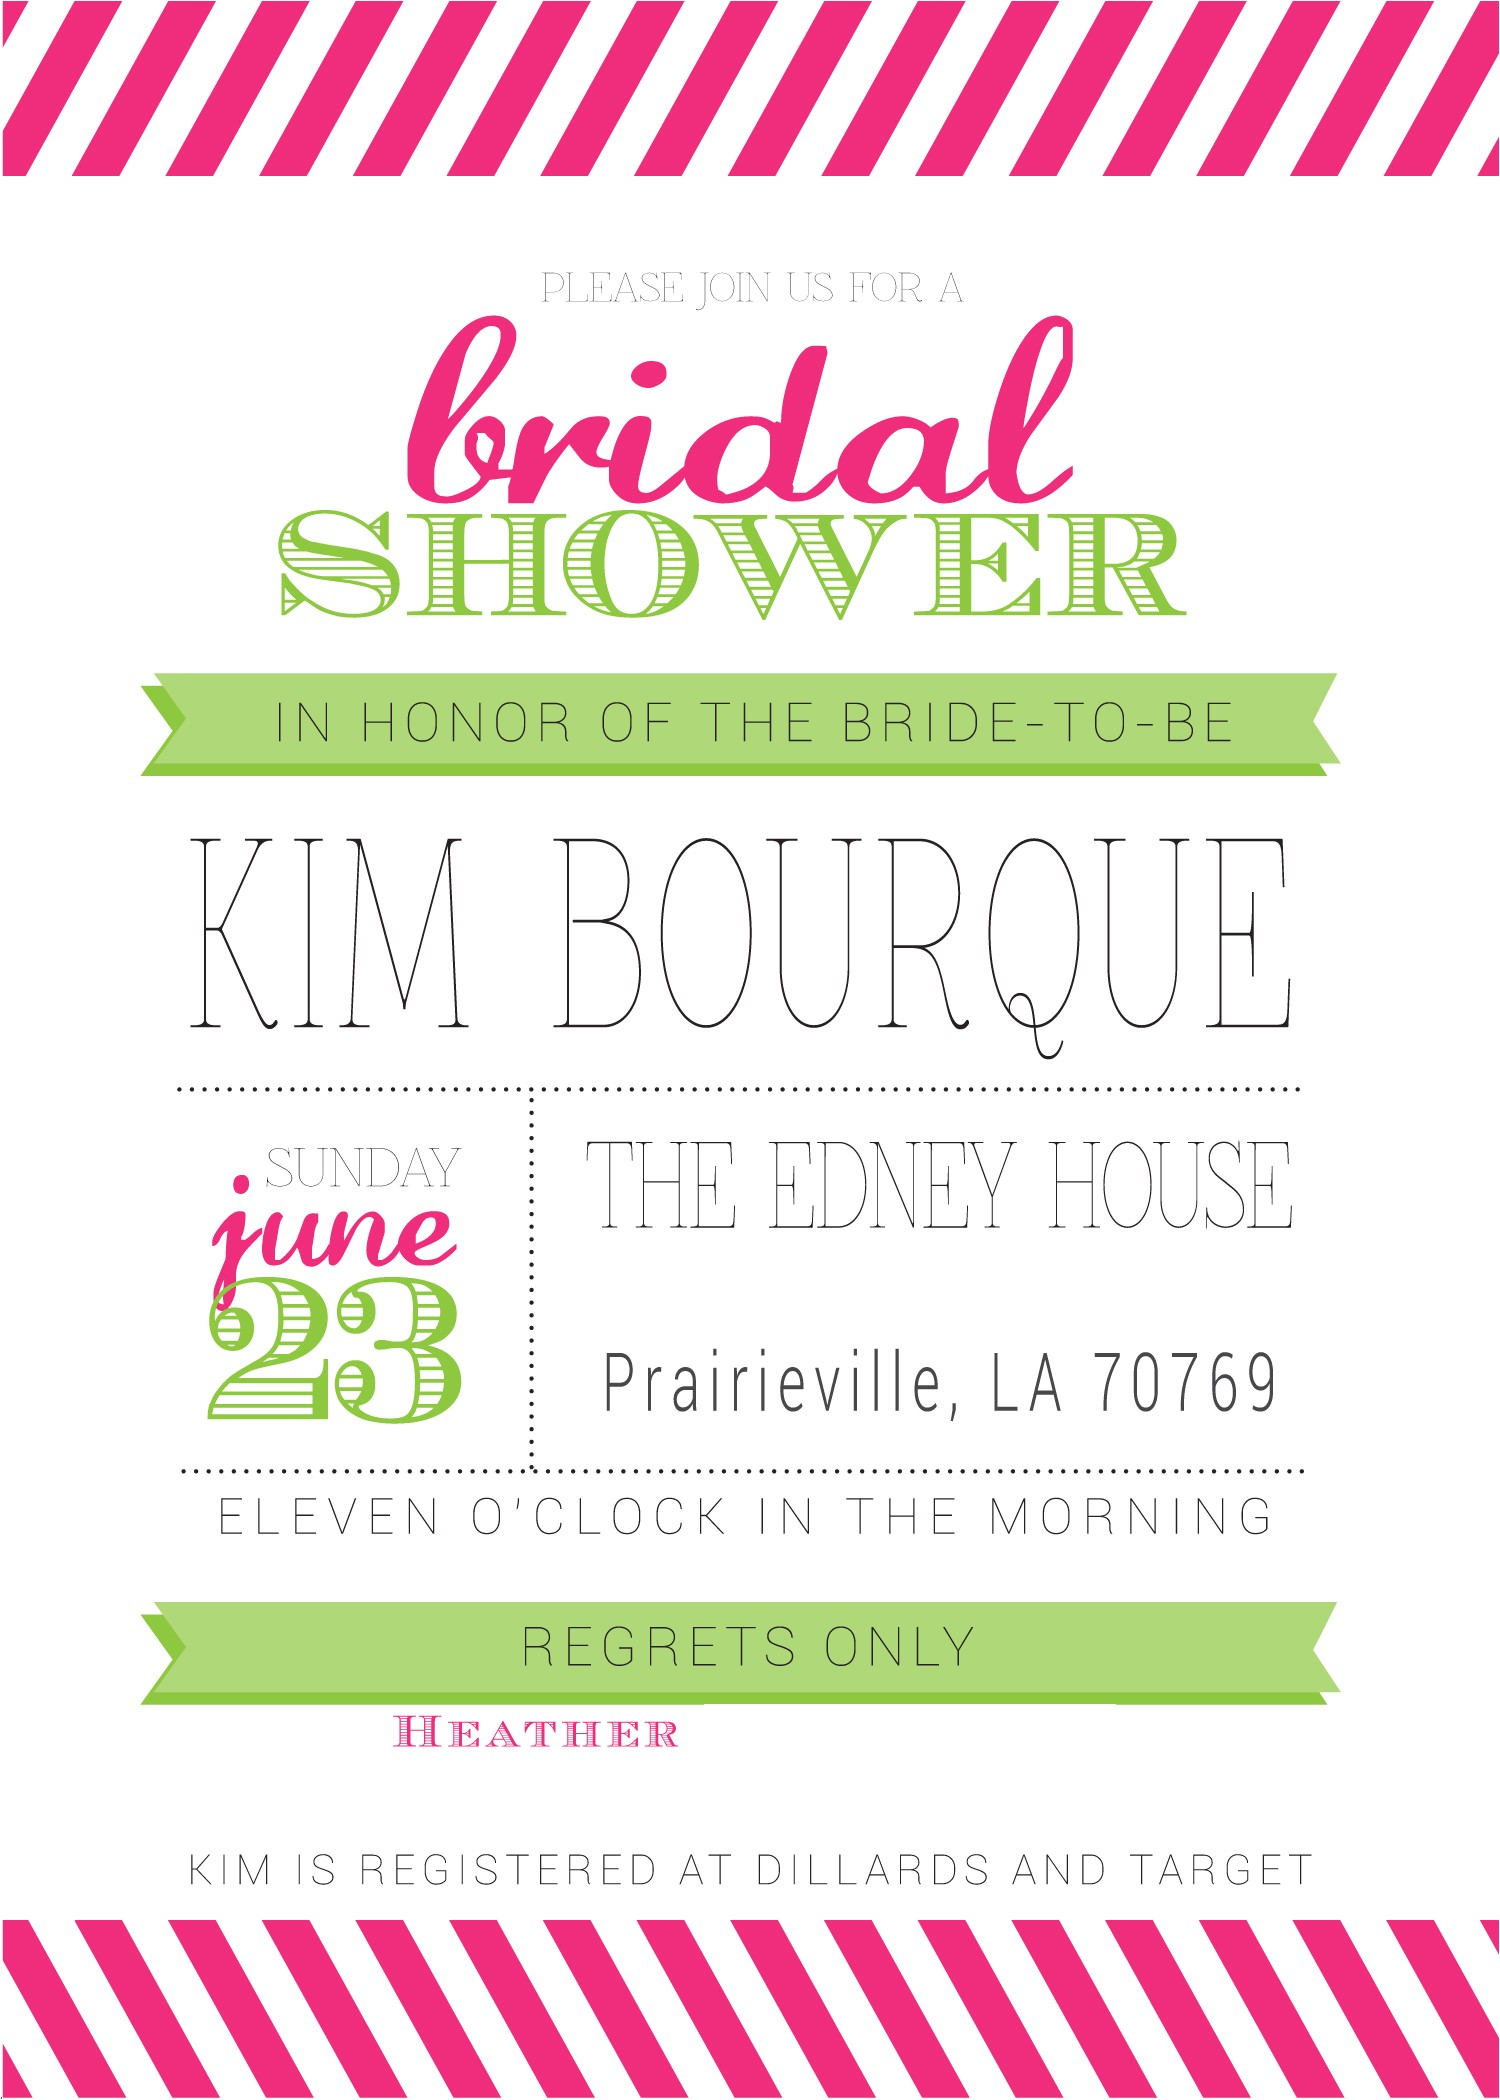 diy wedding invitations kits michaels etsy bridal shower invitations indian bridal shower invitation